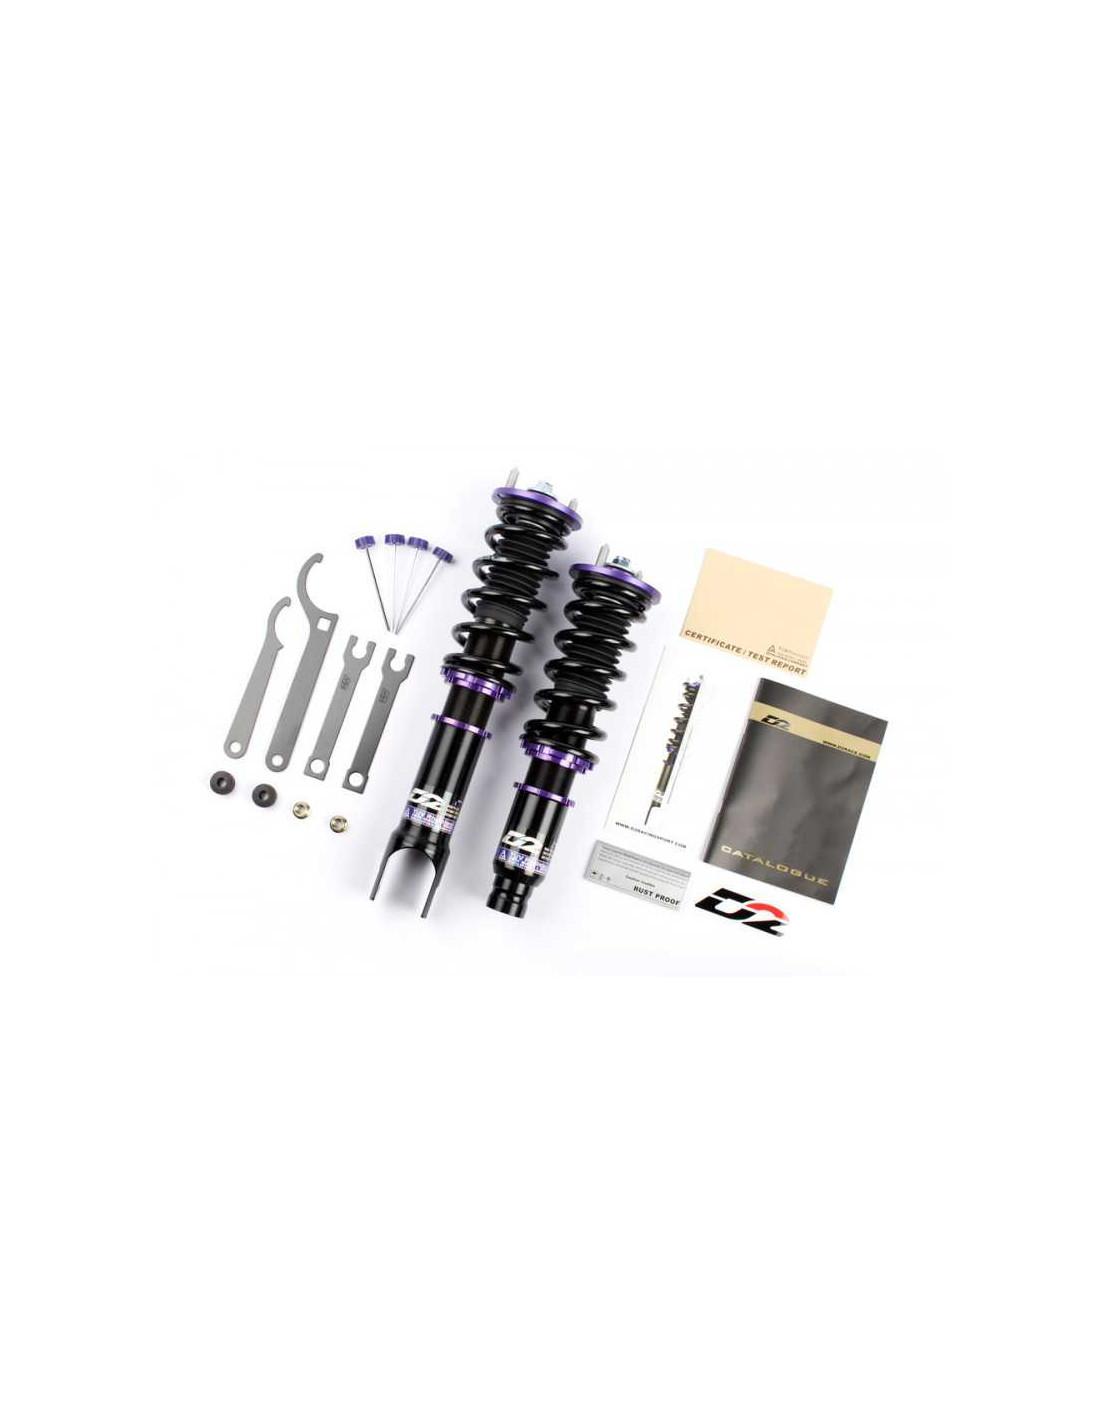 kit combin s filet s d2 street pour honda cr z 890 00. Black Bedroom Furniture Sets. Home Design Ideas